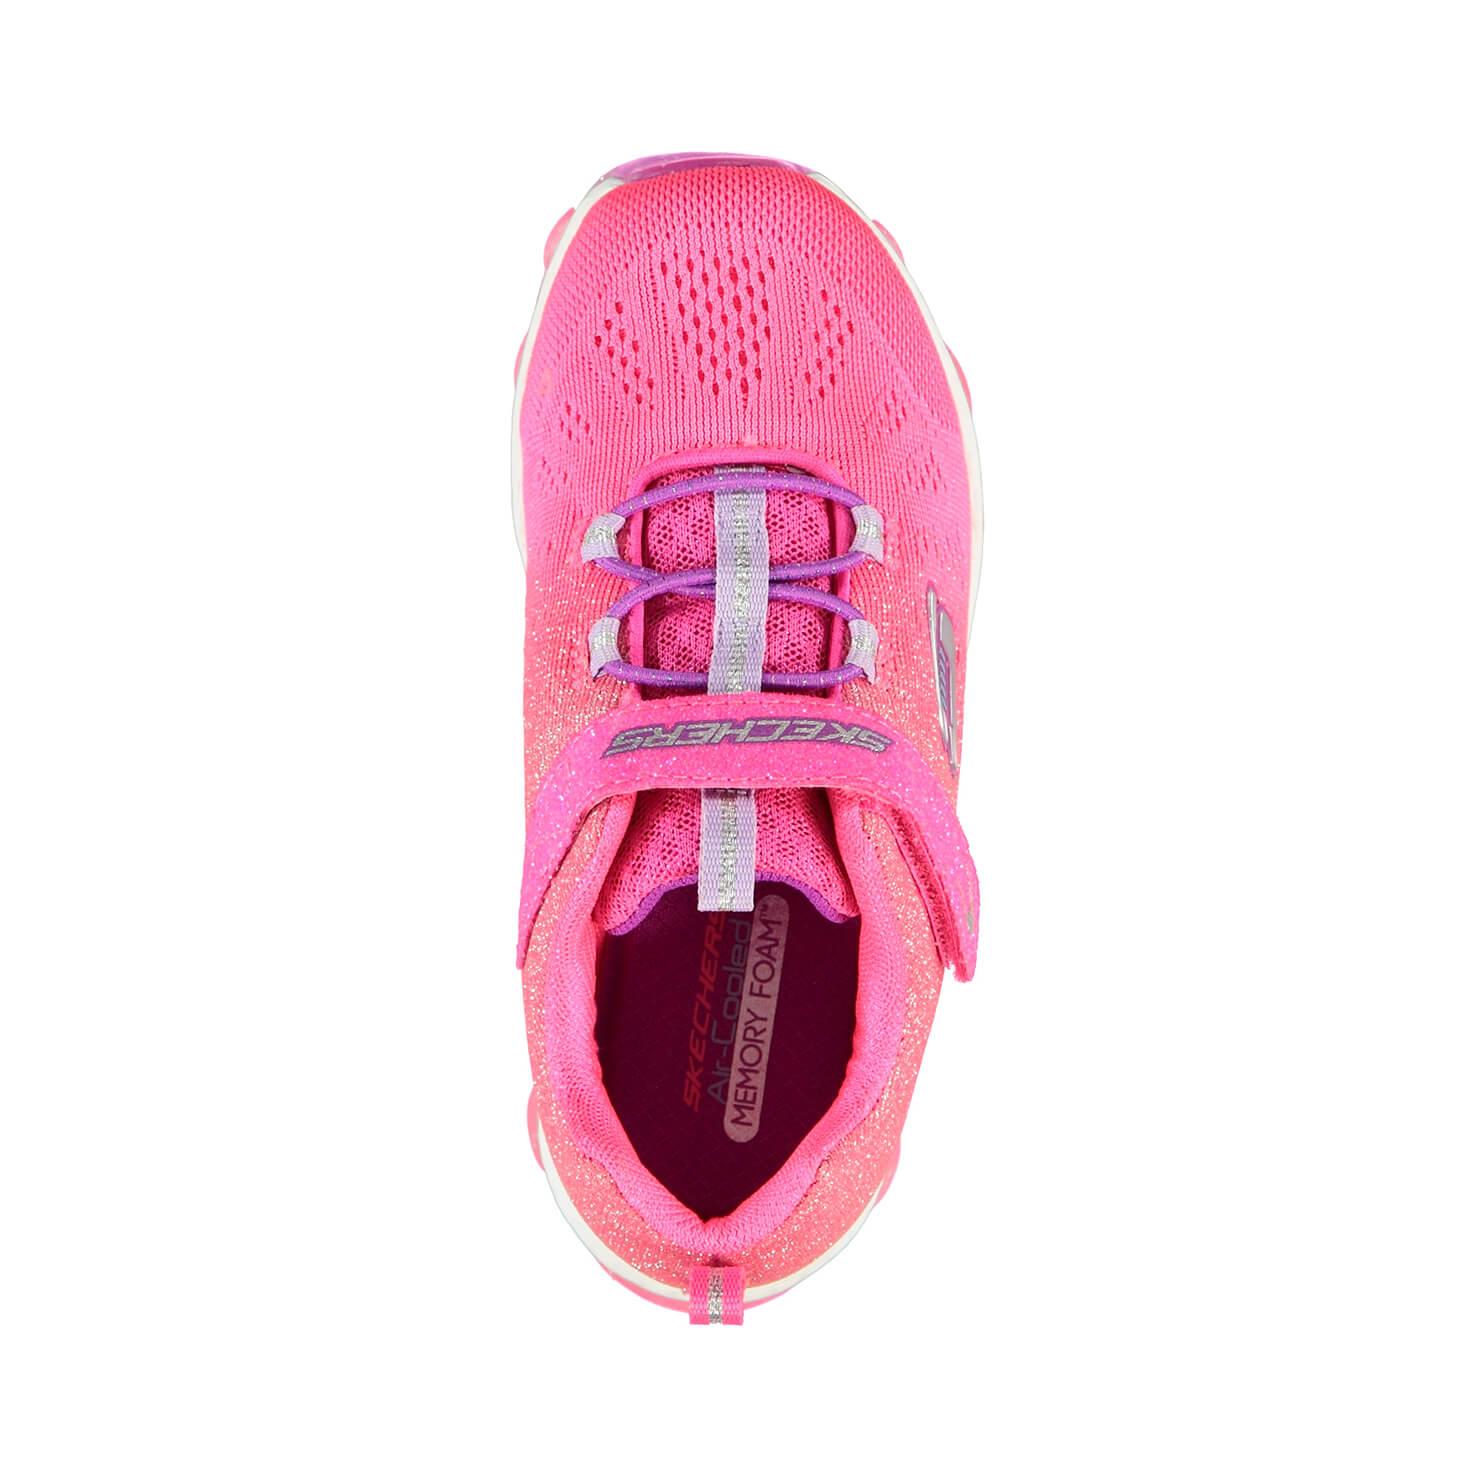 Skechers Skech-Air Ultra Çocuk Pembe Spor Ayakkabı